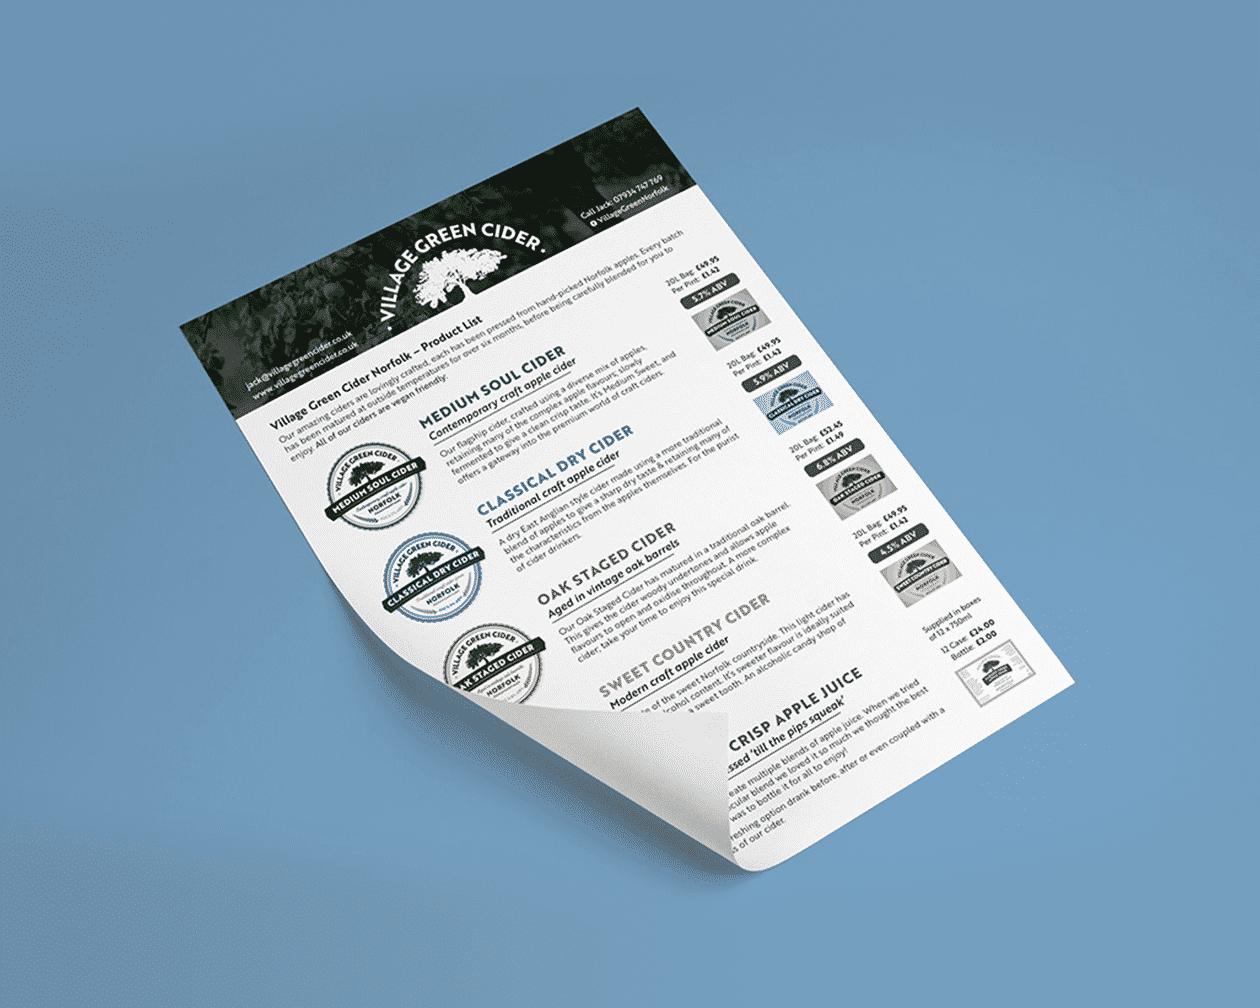 Cider Sales Sheet Printed